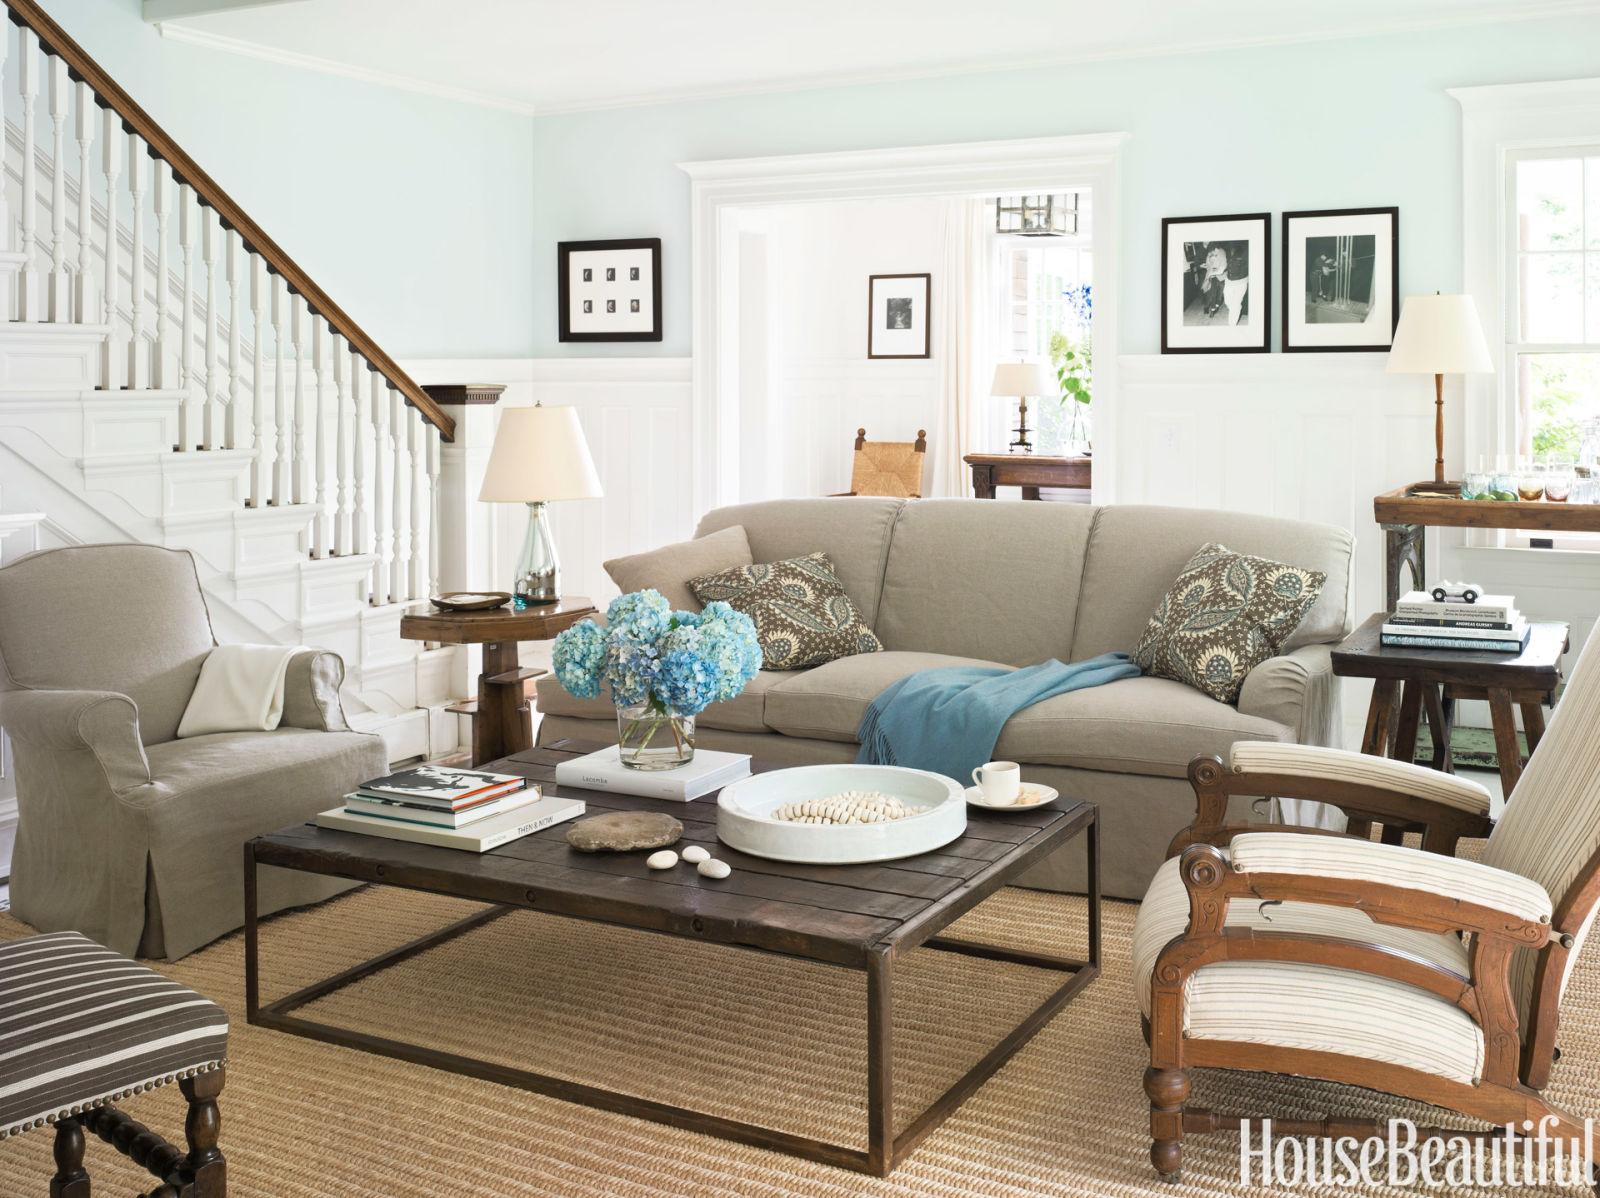 shaker style cottage - robert stilin cottage design